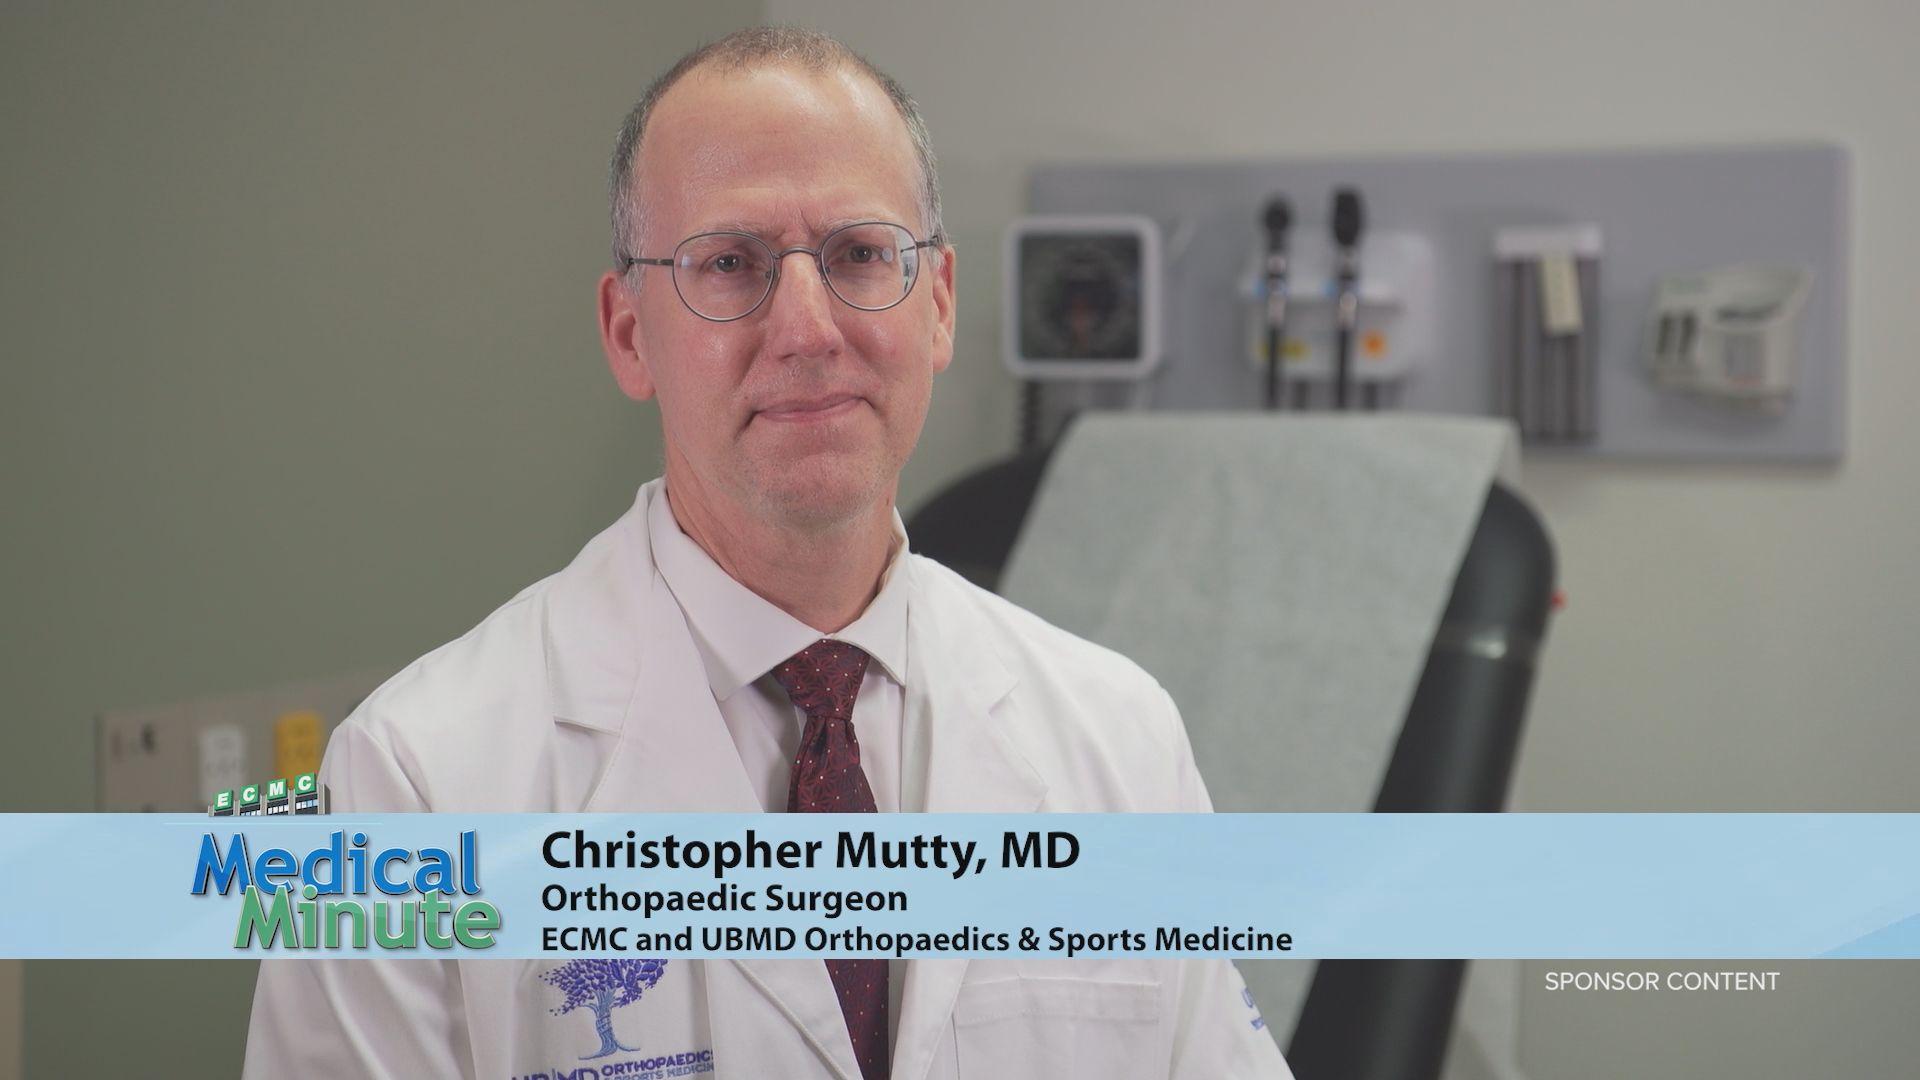 ECMCMedicalMinute Dr.ChristopherMutty FractureCare 100421 STILL